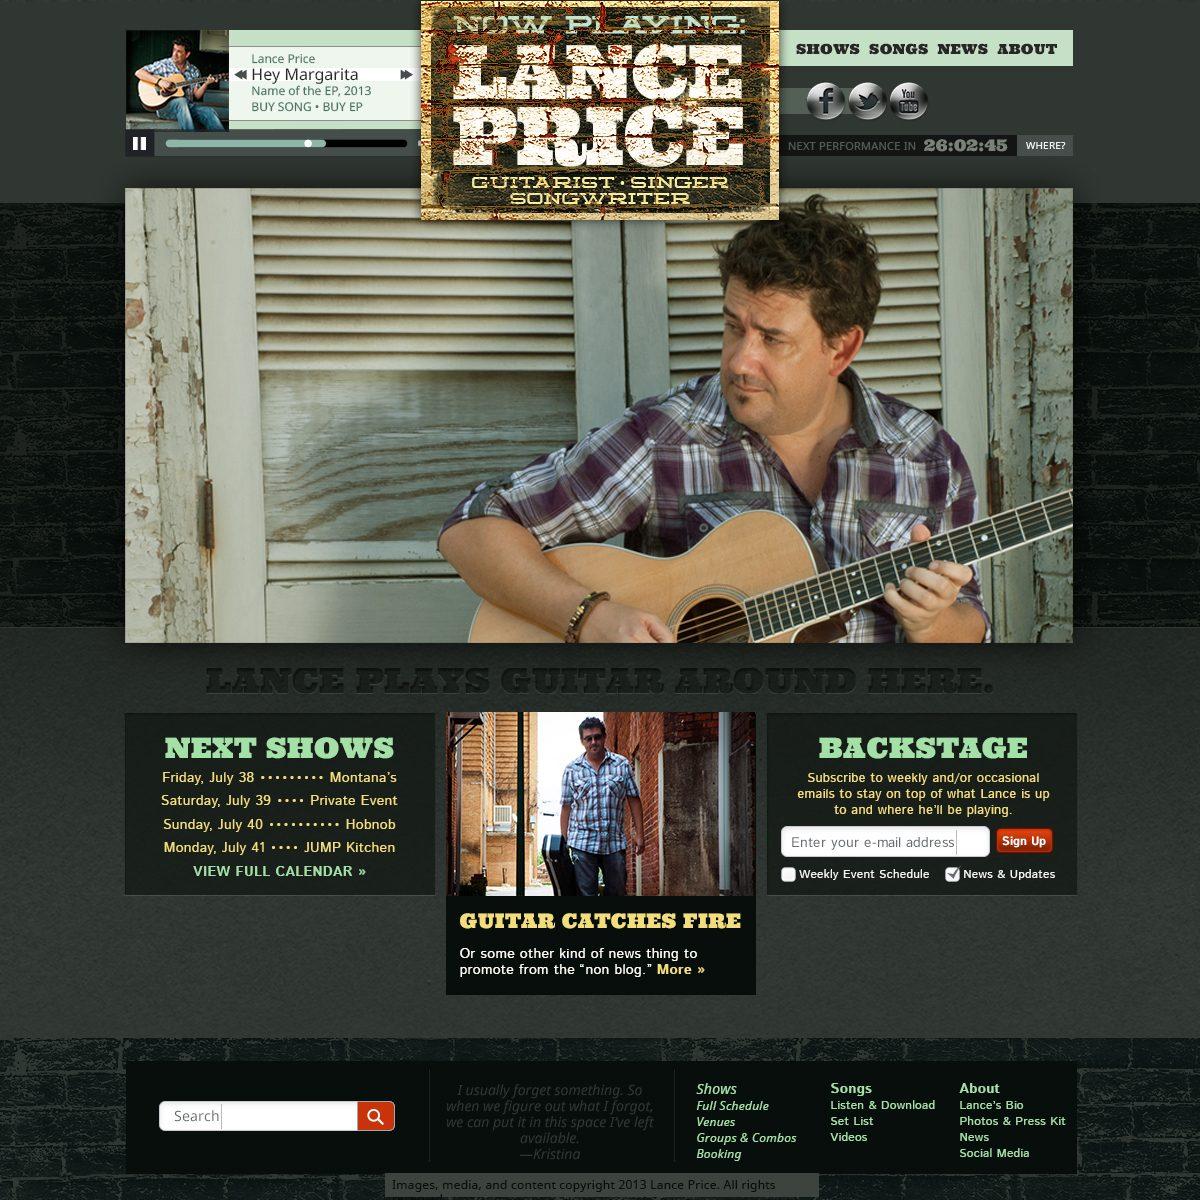 LancePrice.net